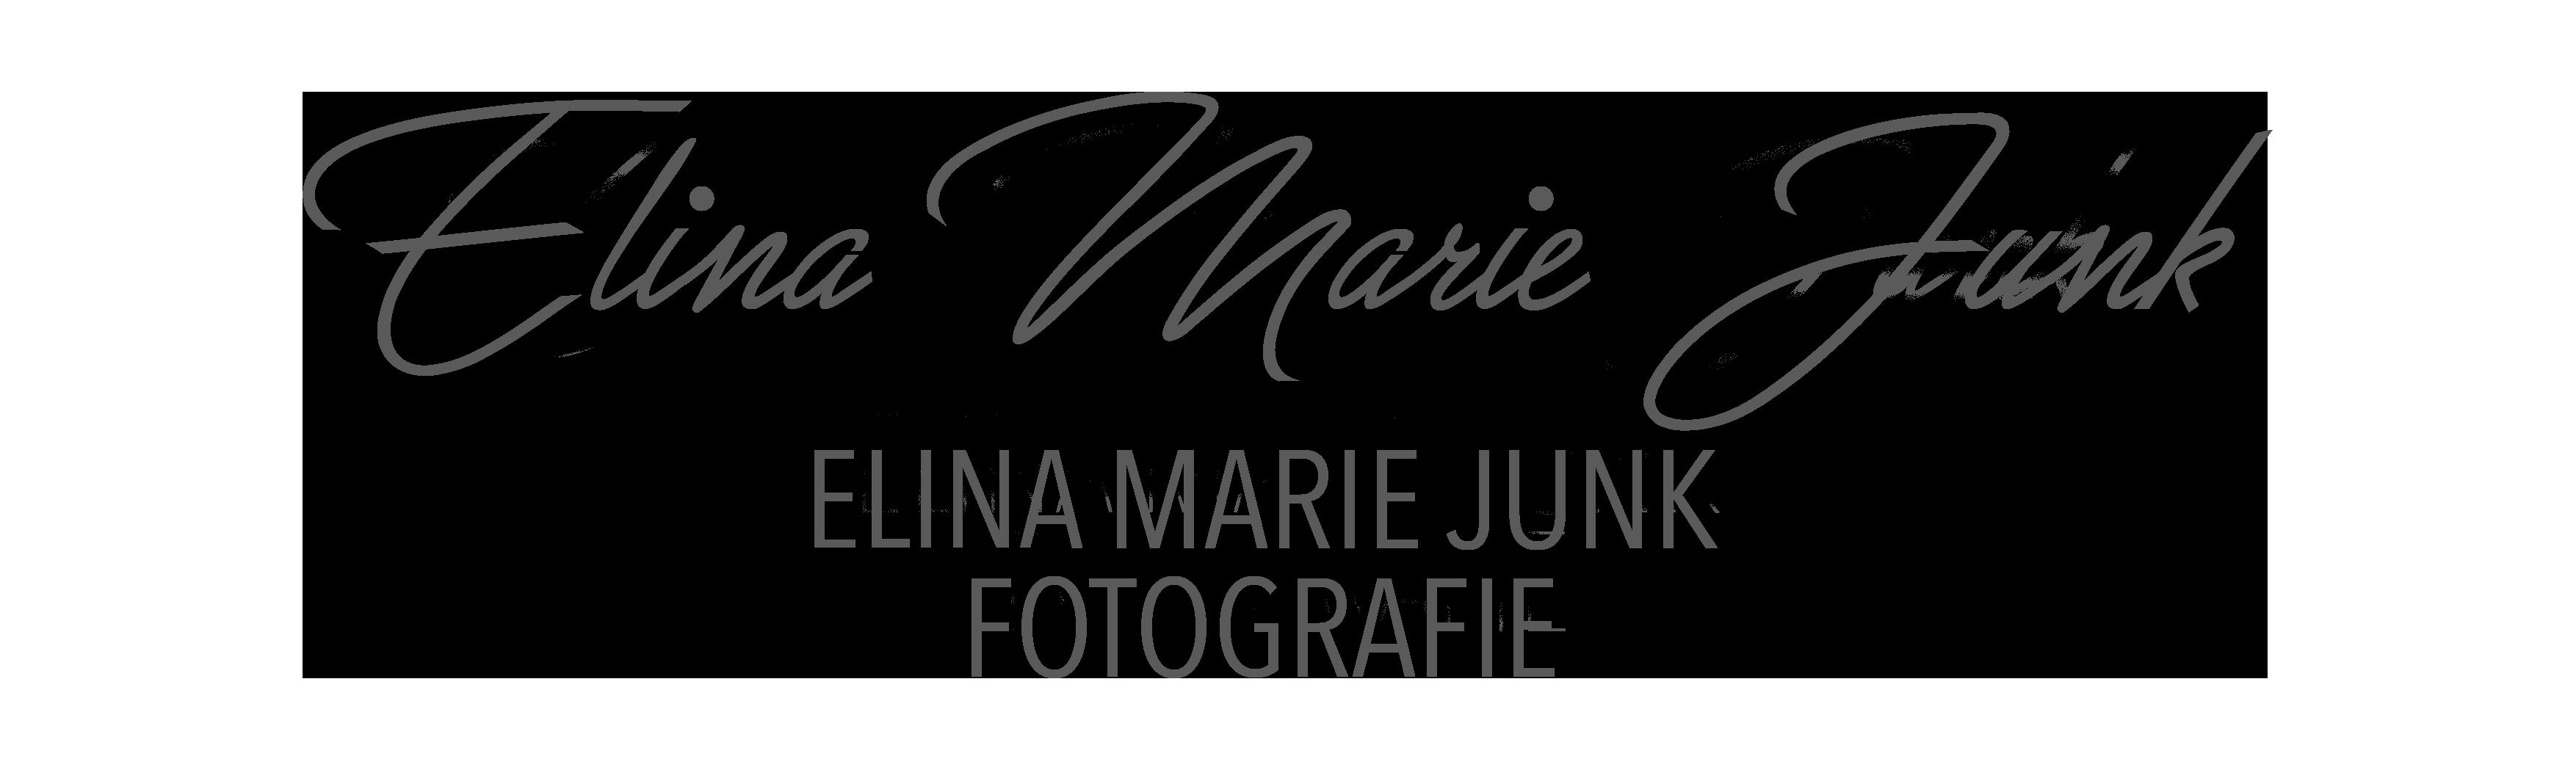 Elina Marie Junk Fotografie